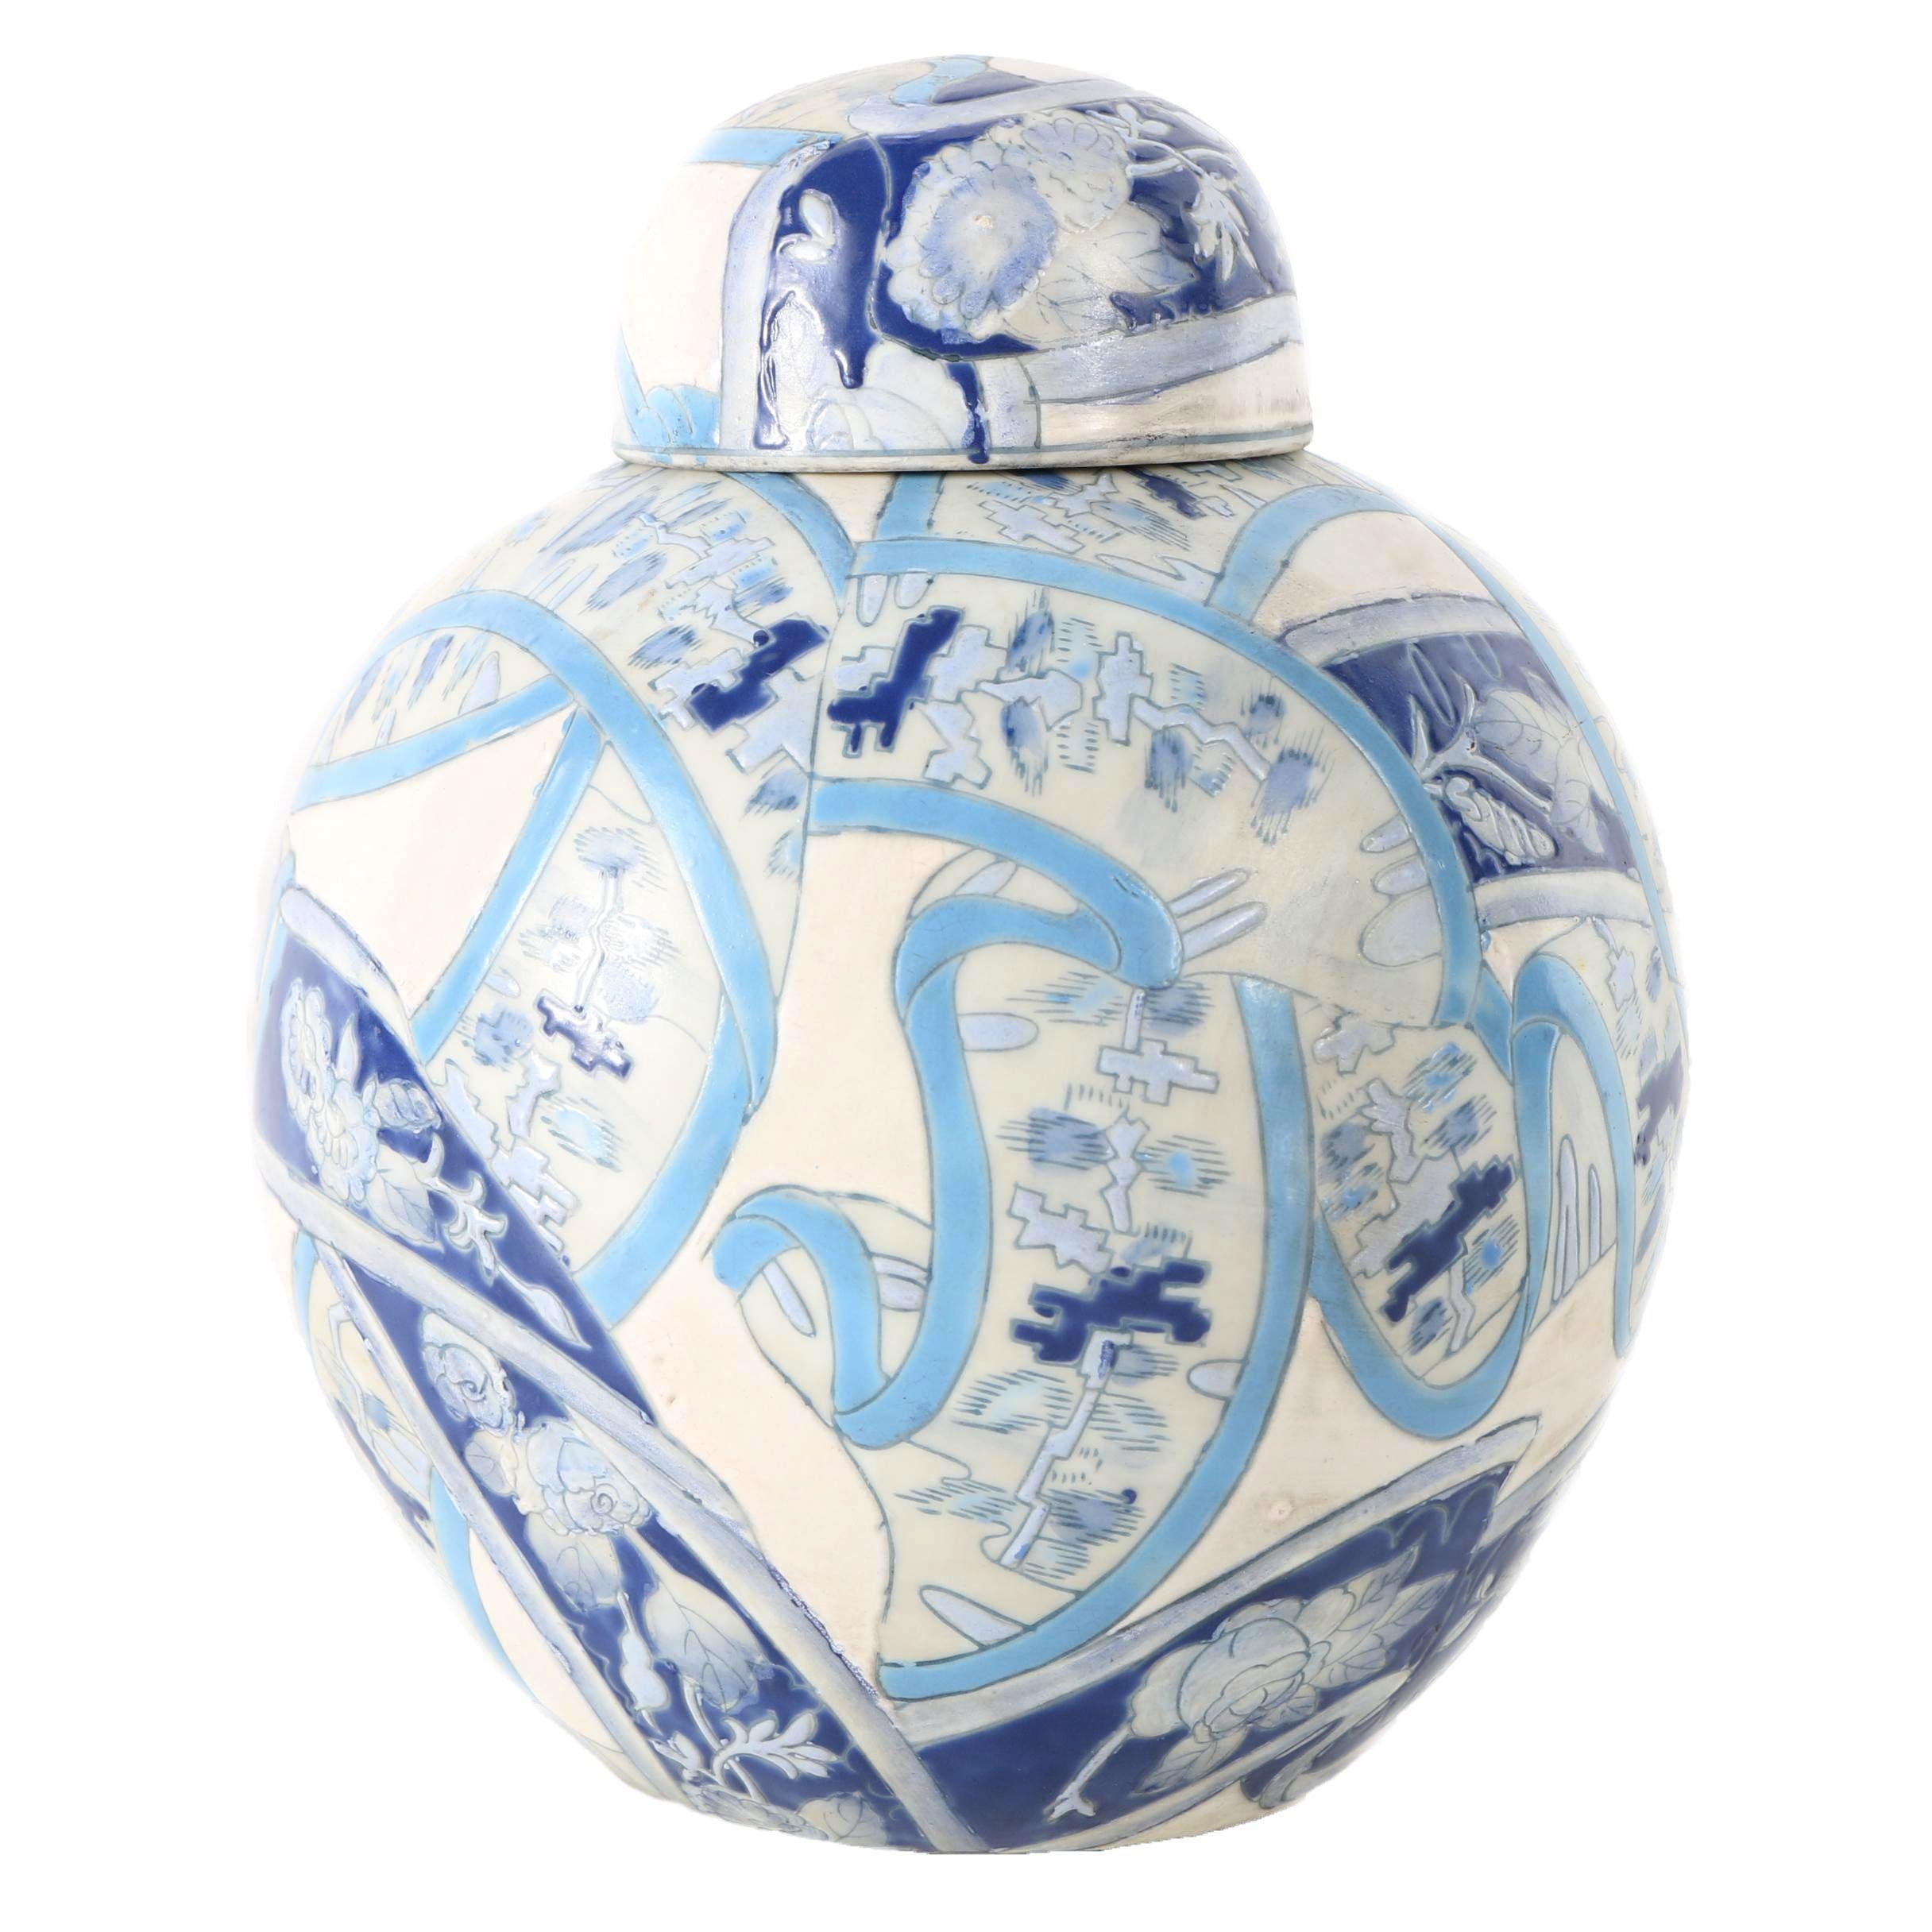 Ceramic Blue and White Lidded Vessel